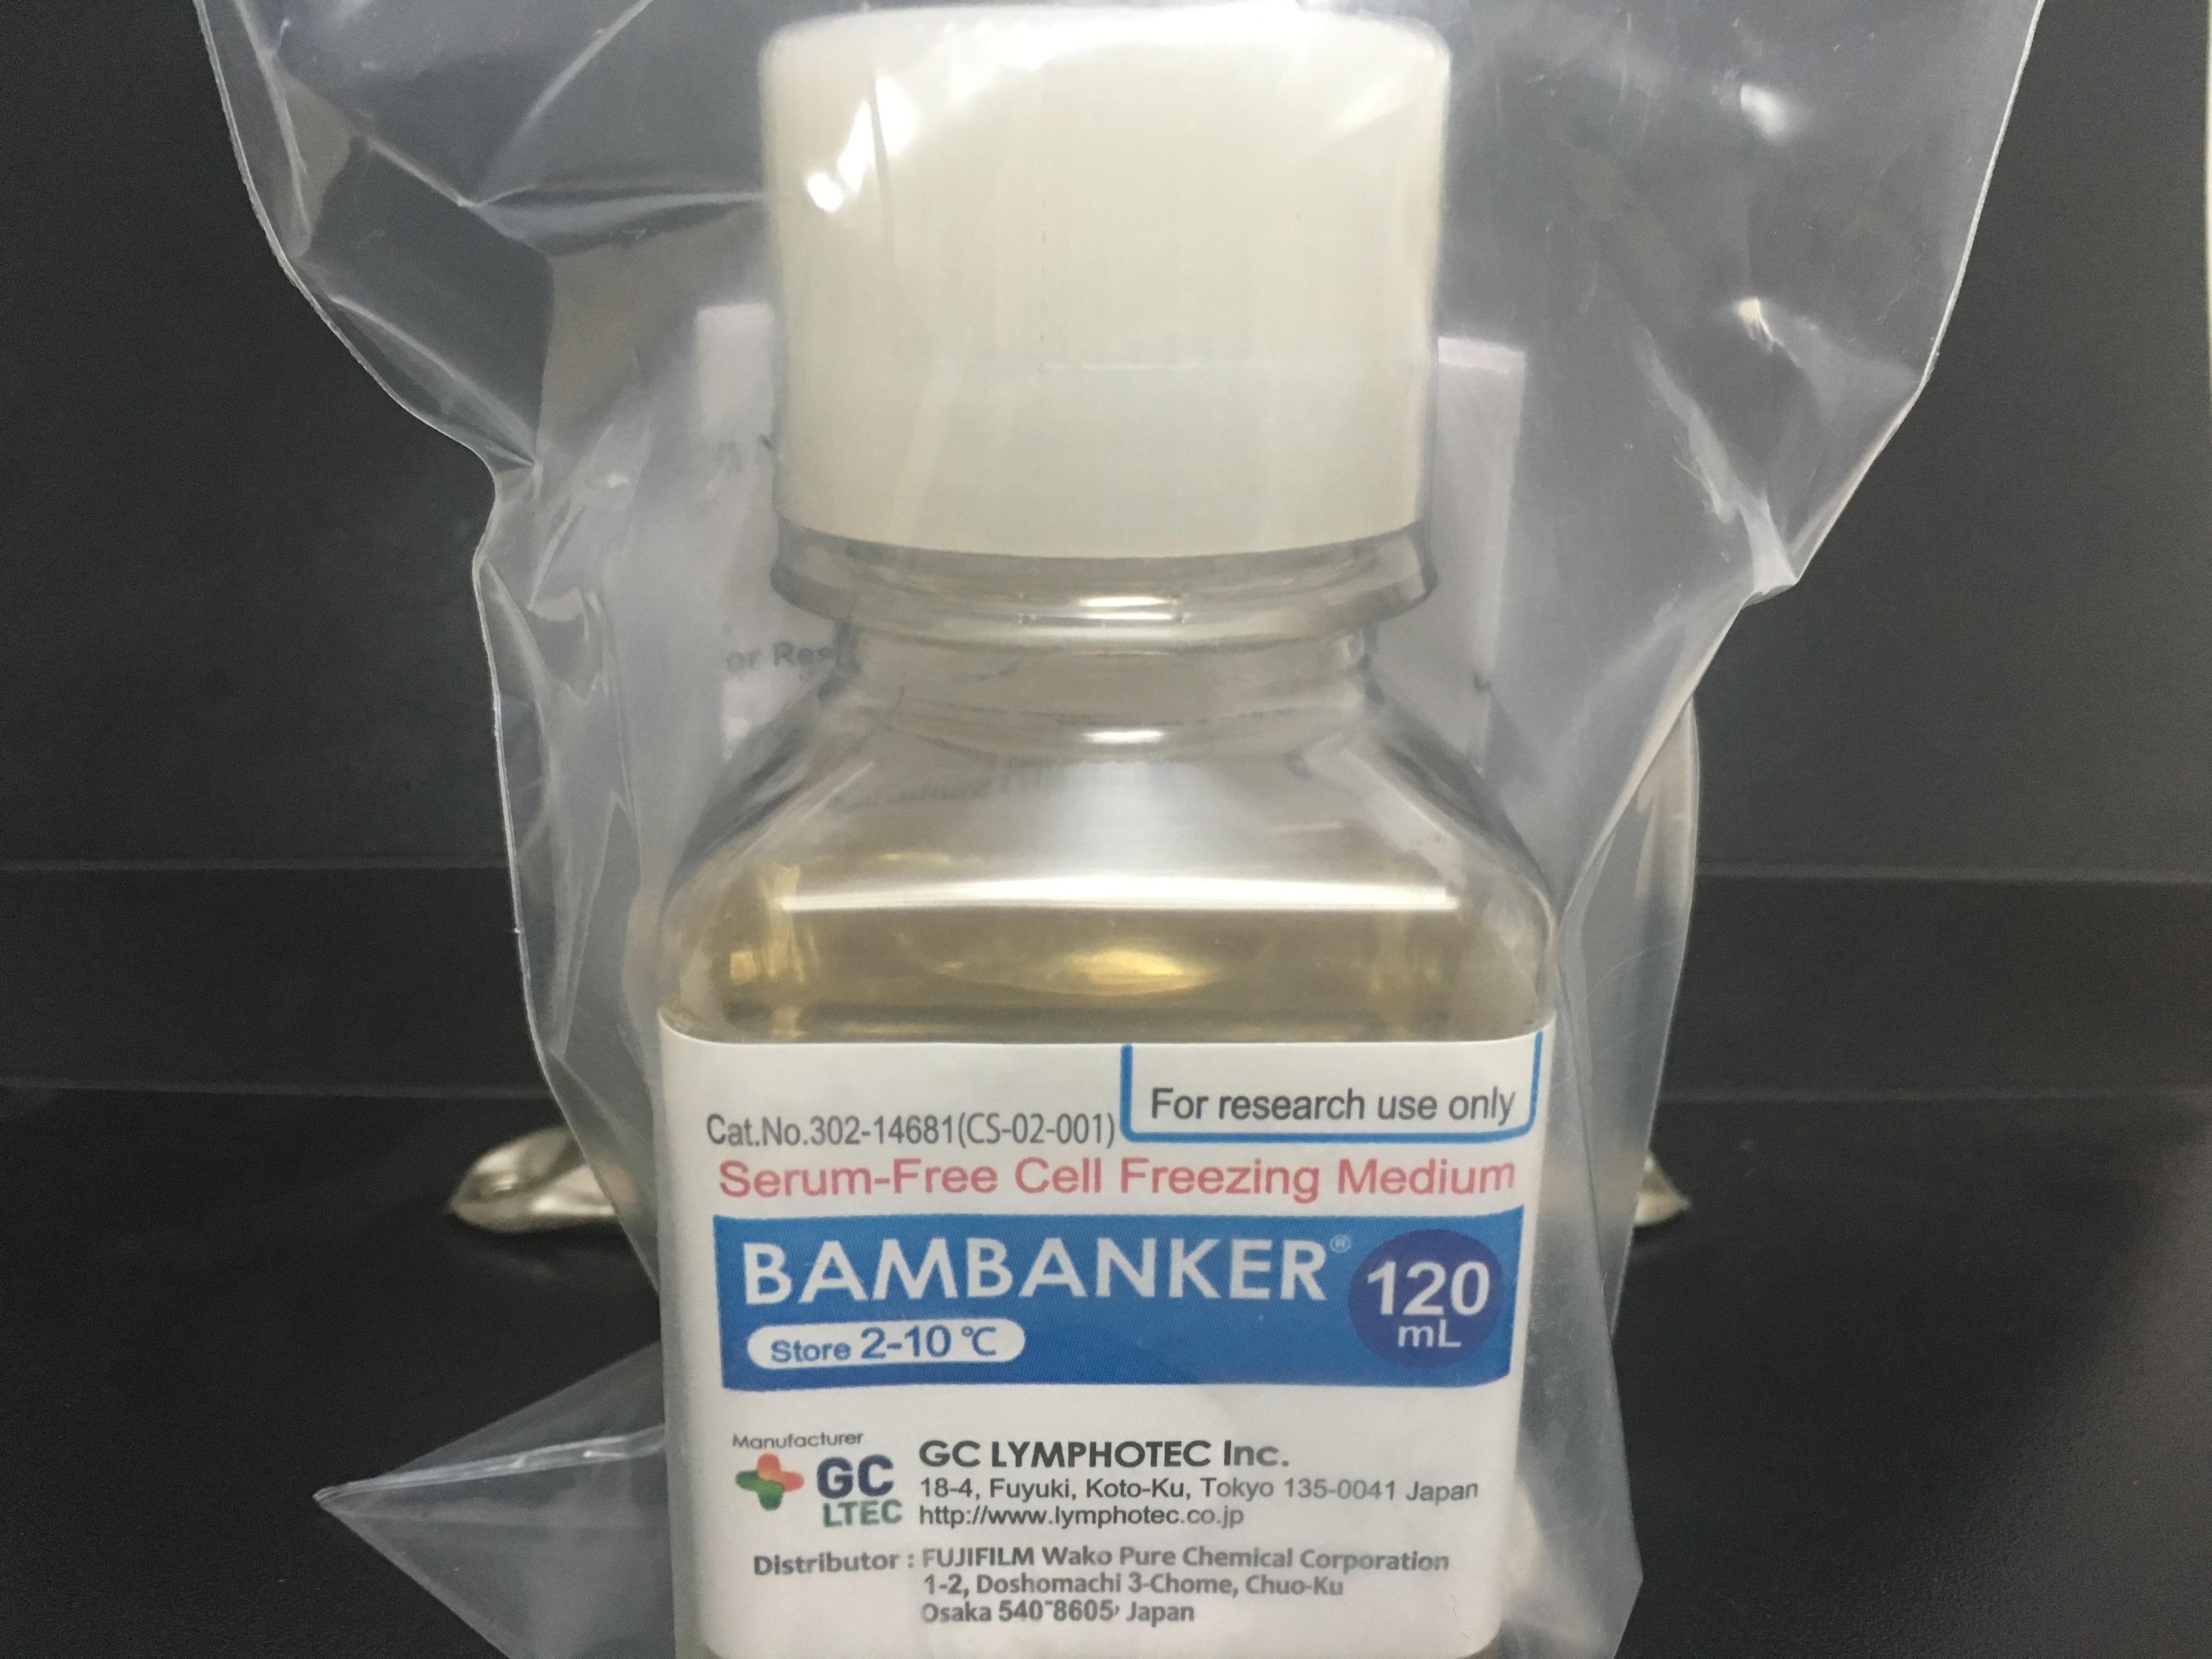 BAMBANKER即用型无血清细胞冻存液